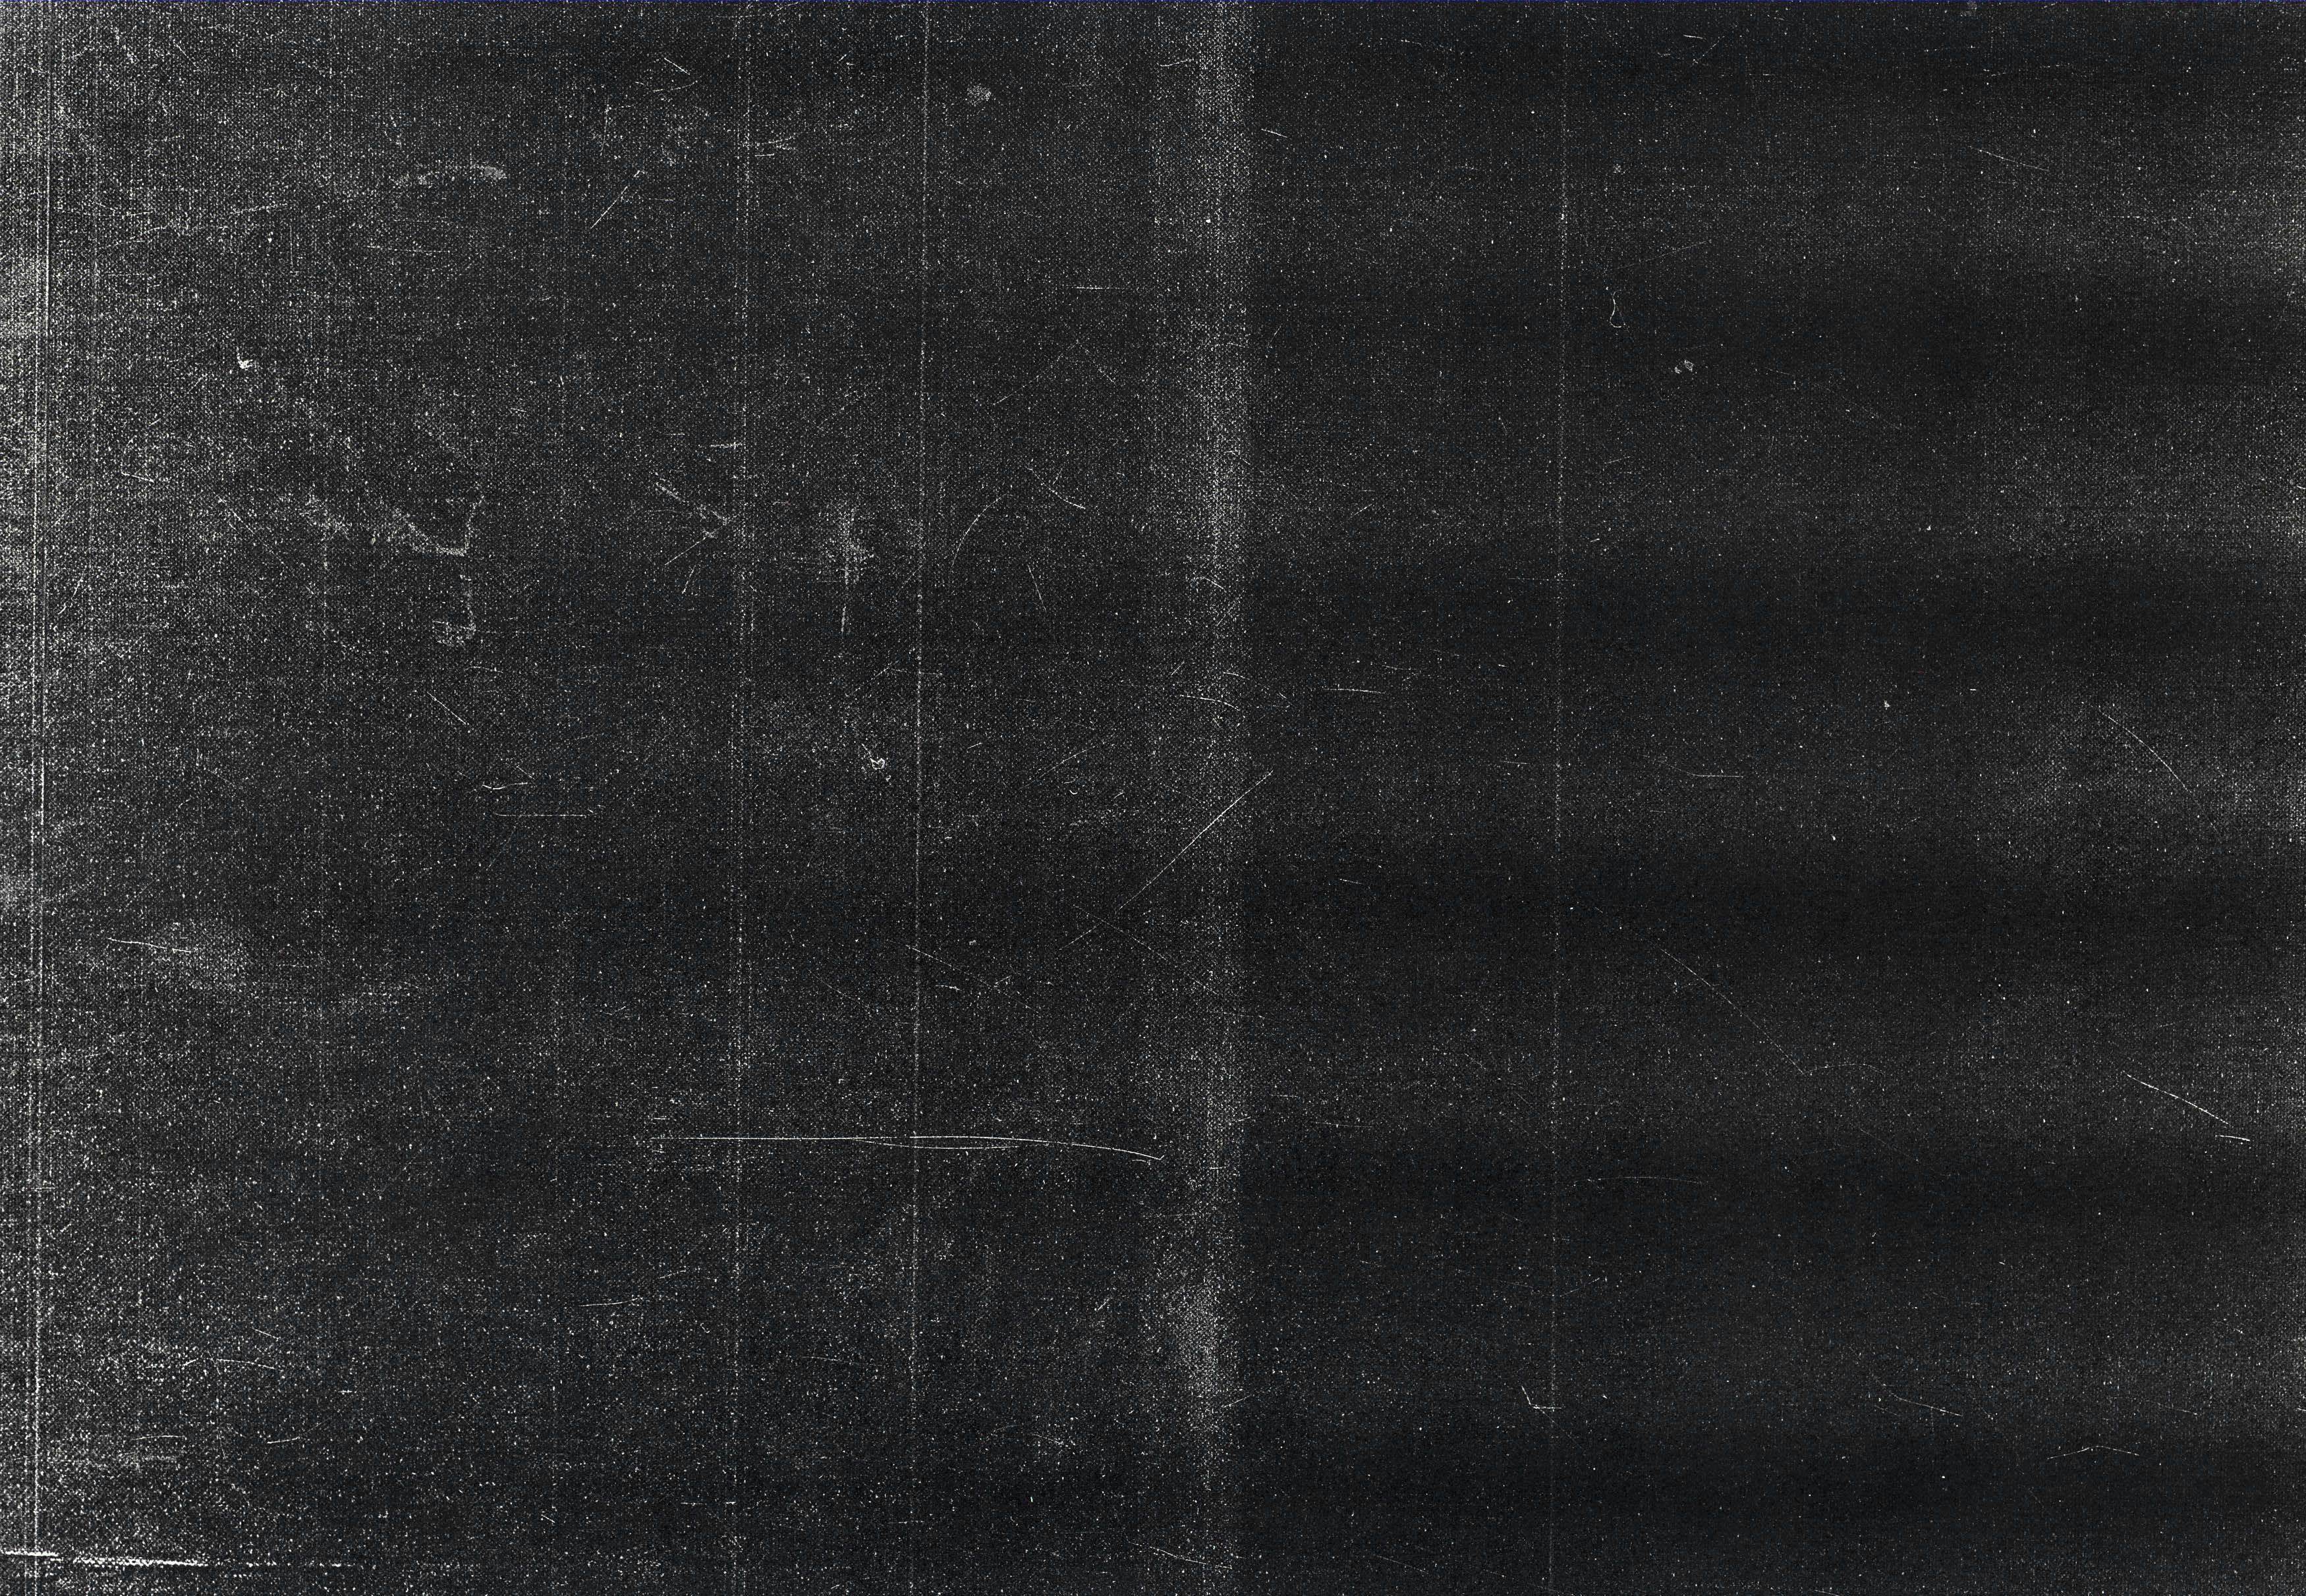 11 Photocopy Textures Vol 3 Photo Texture Texture Grunge Textures